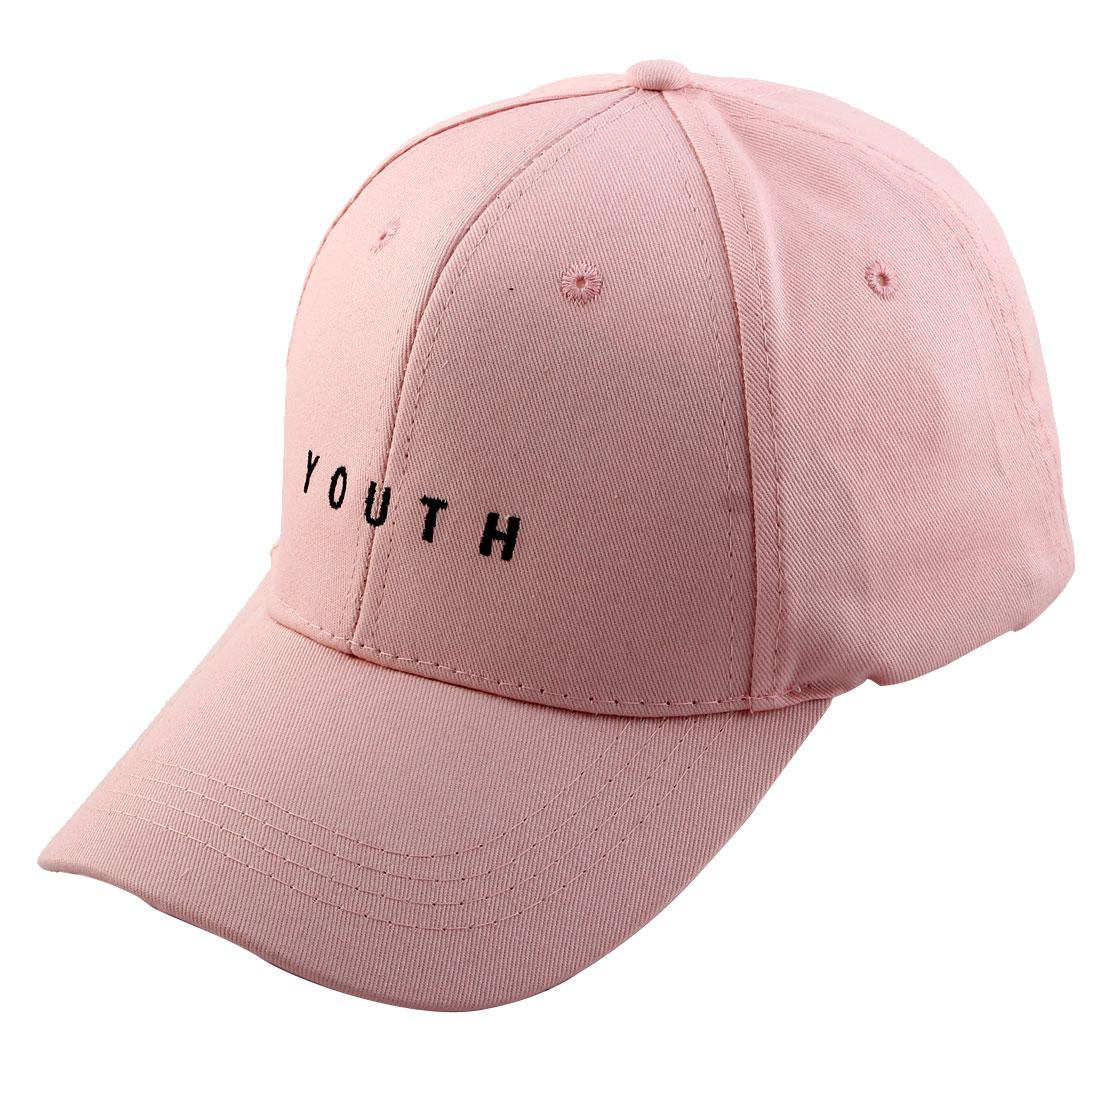 Unisex Cotton Blends Letters Pattern Tennis Golf Baseball Sun Visor Hat Cap